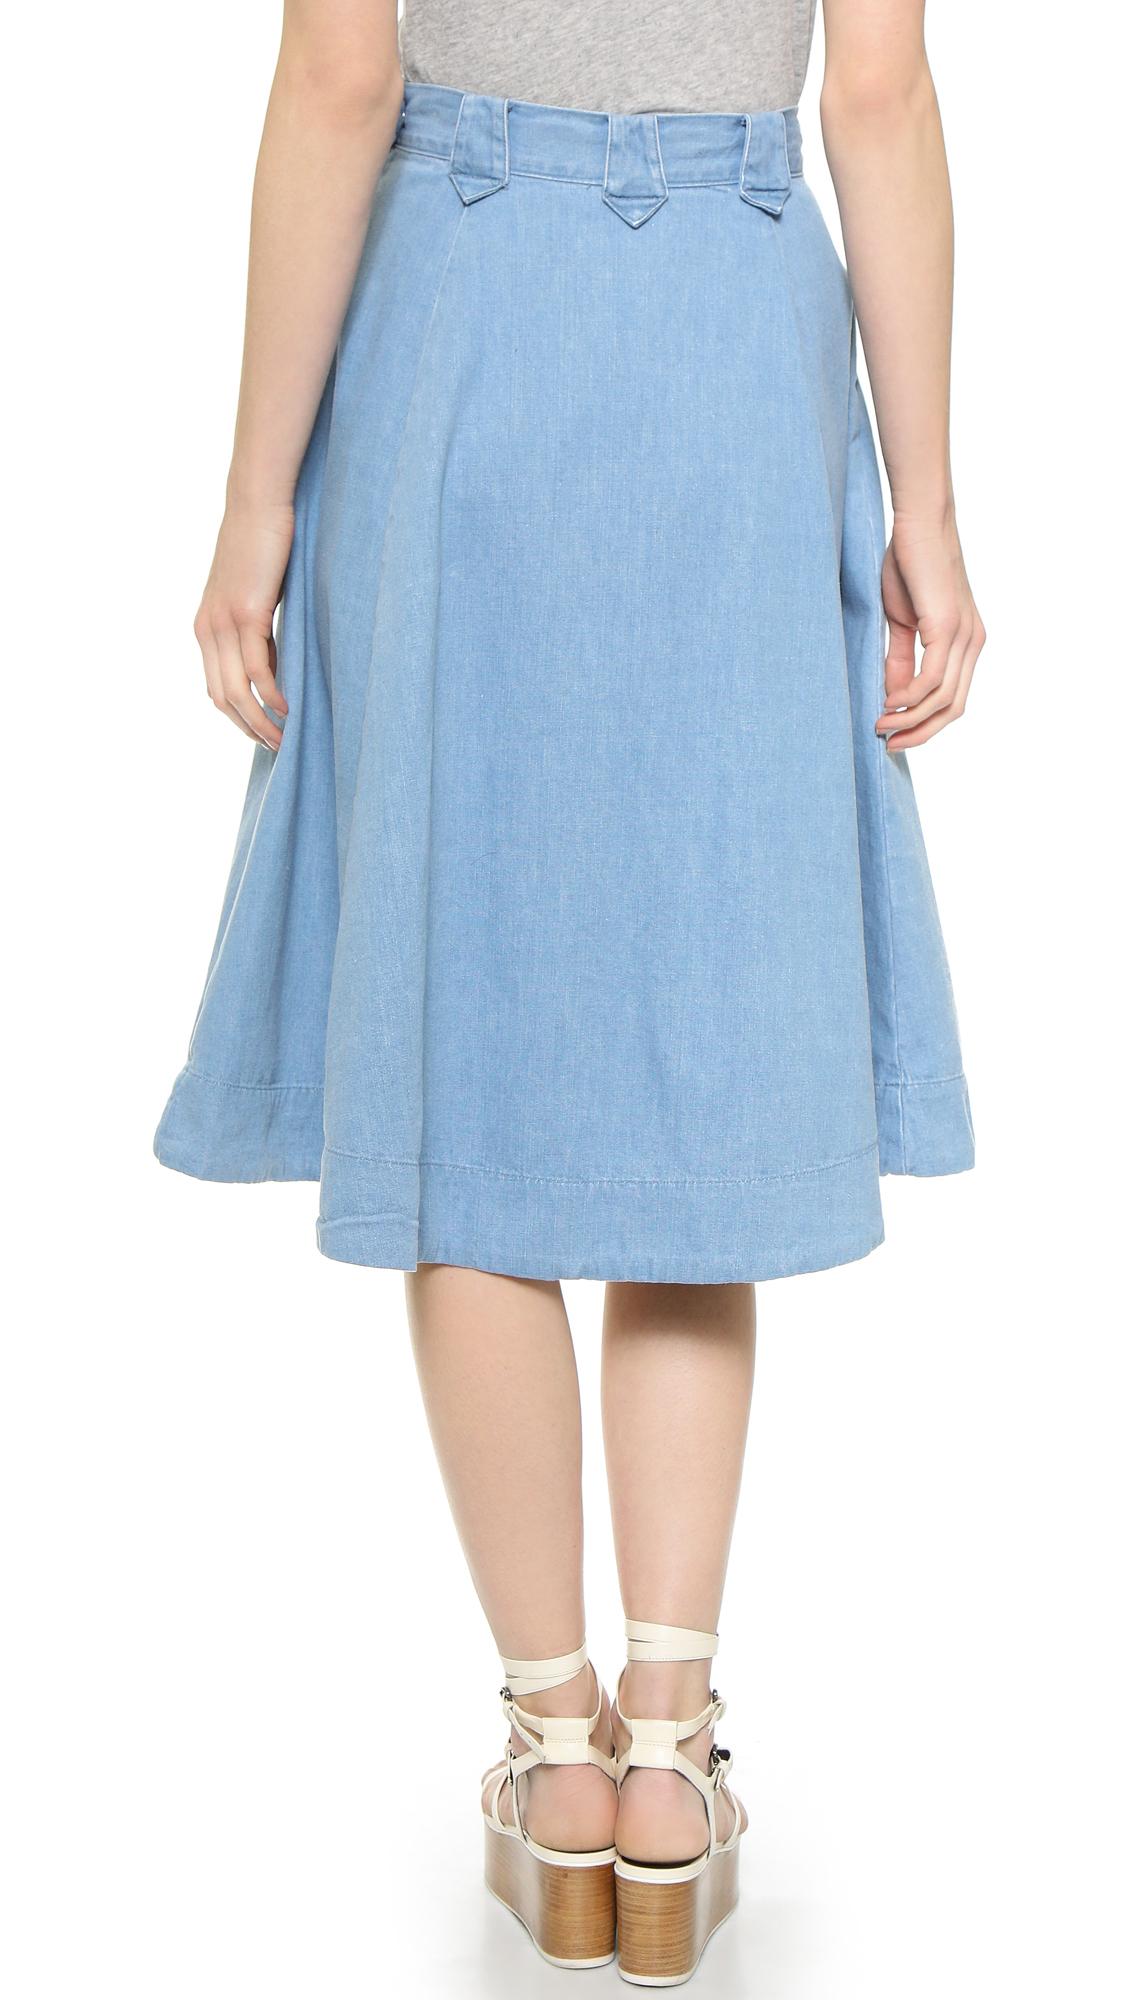 Levi's Dresses